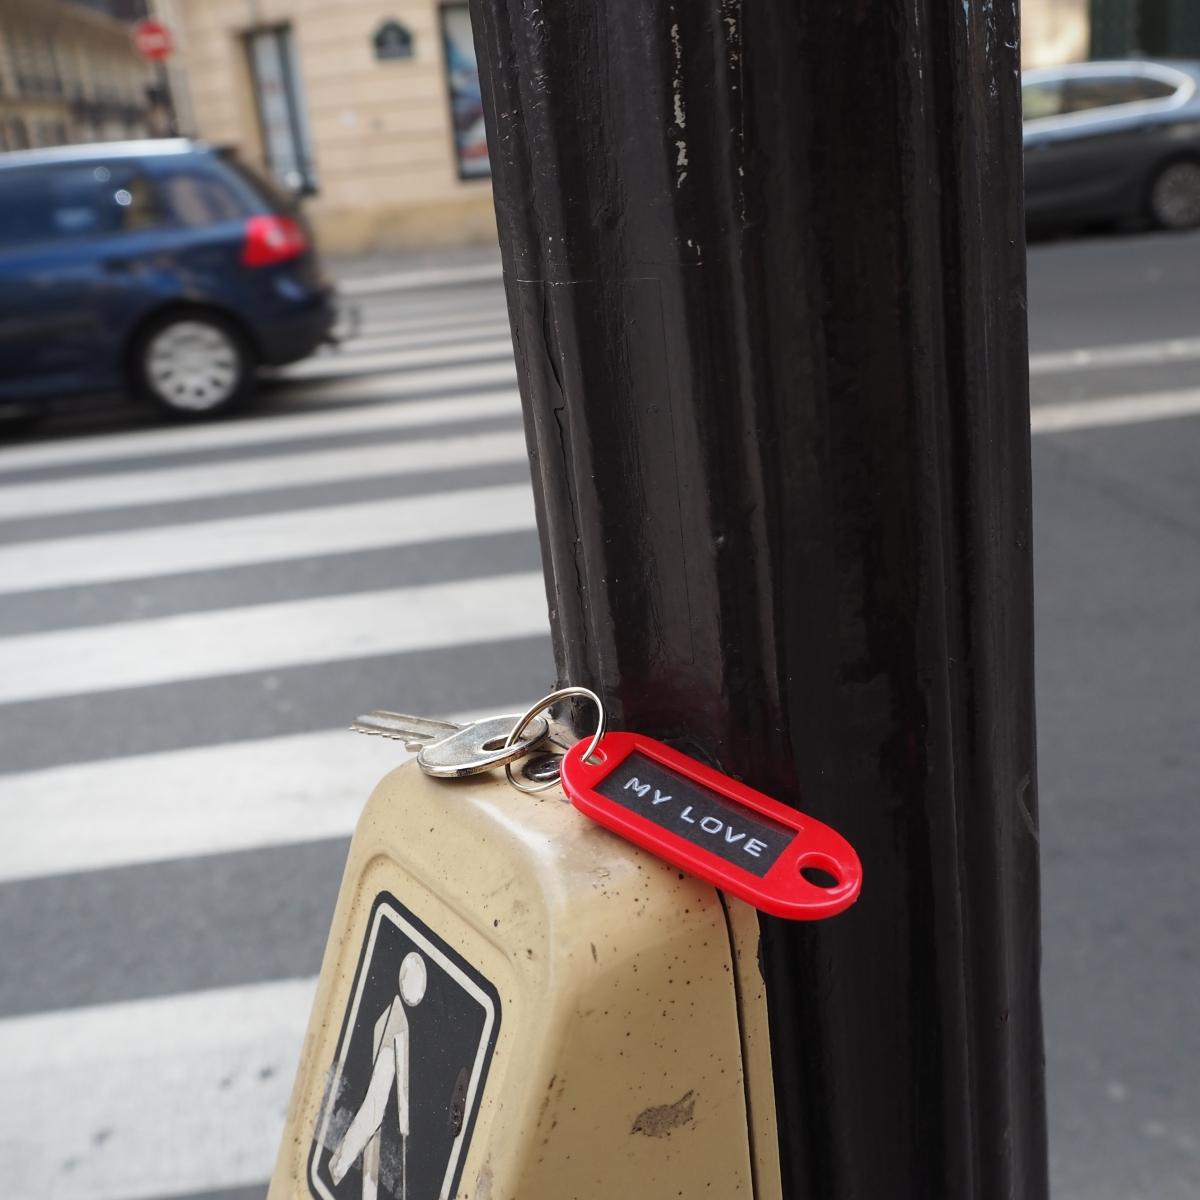 Lost and found « My Love » Key – Paris – 2016 – Le Sonneur